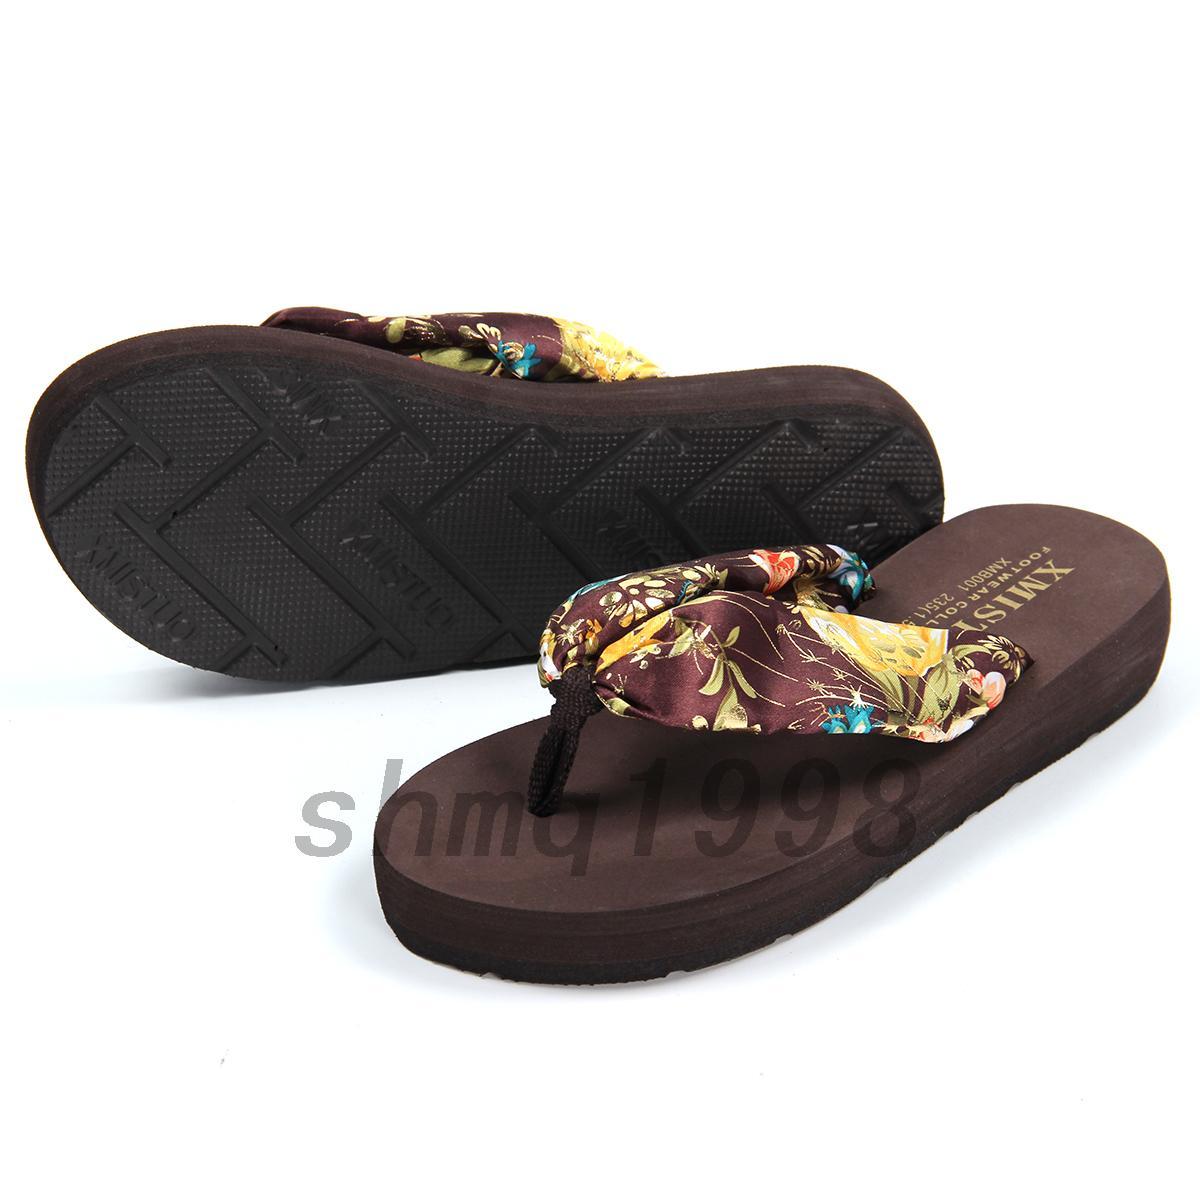 zehentrenner sandale badelatschen damen strand sommerschuhe badeschuhe sandalen ebay. Black Bedroom Furniture Sets. Home Design Ideas